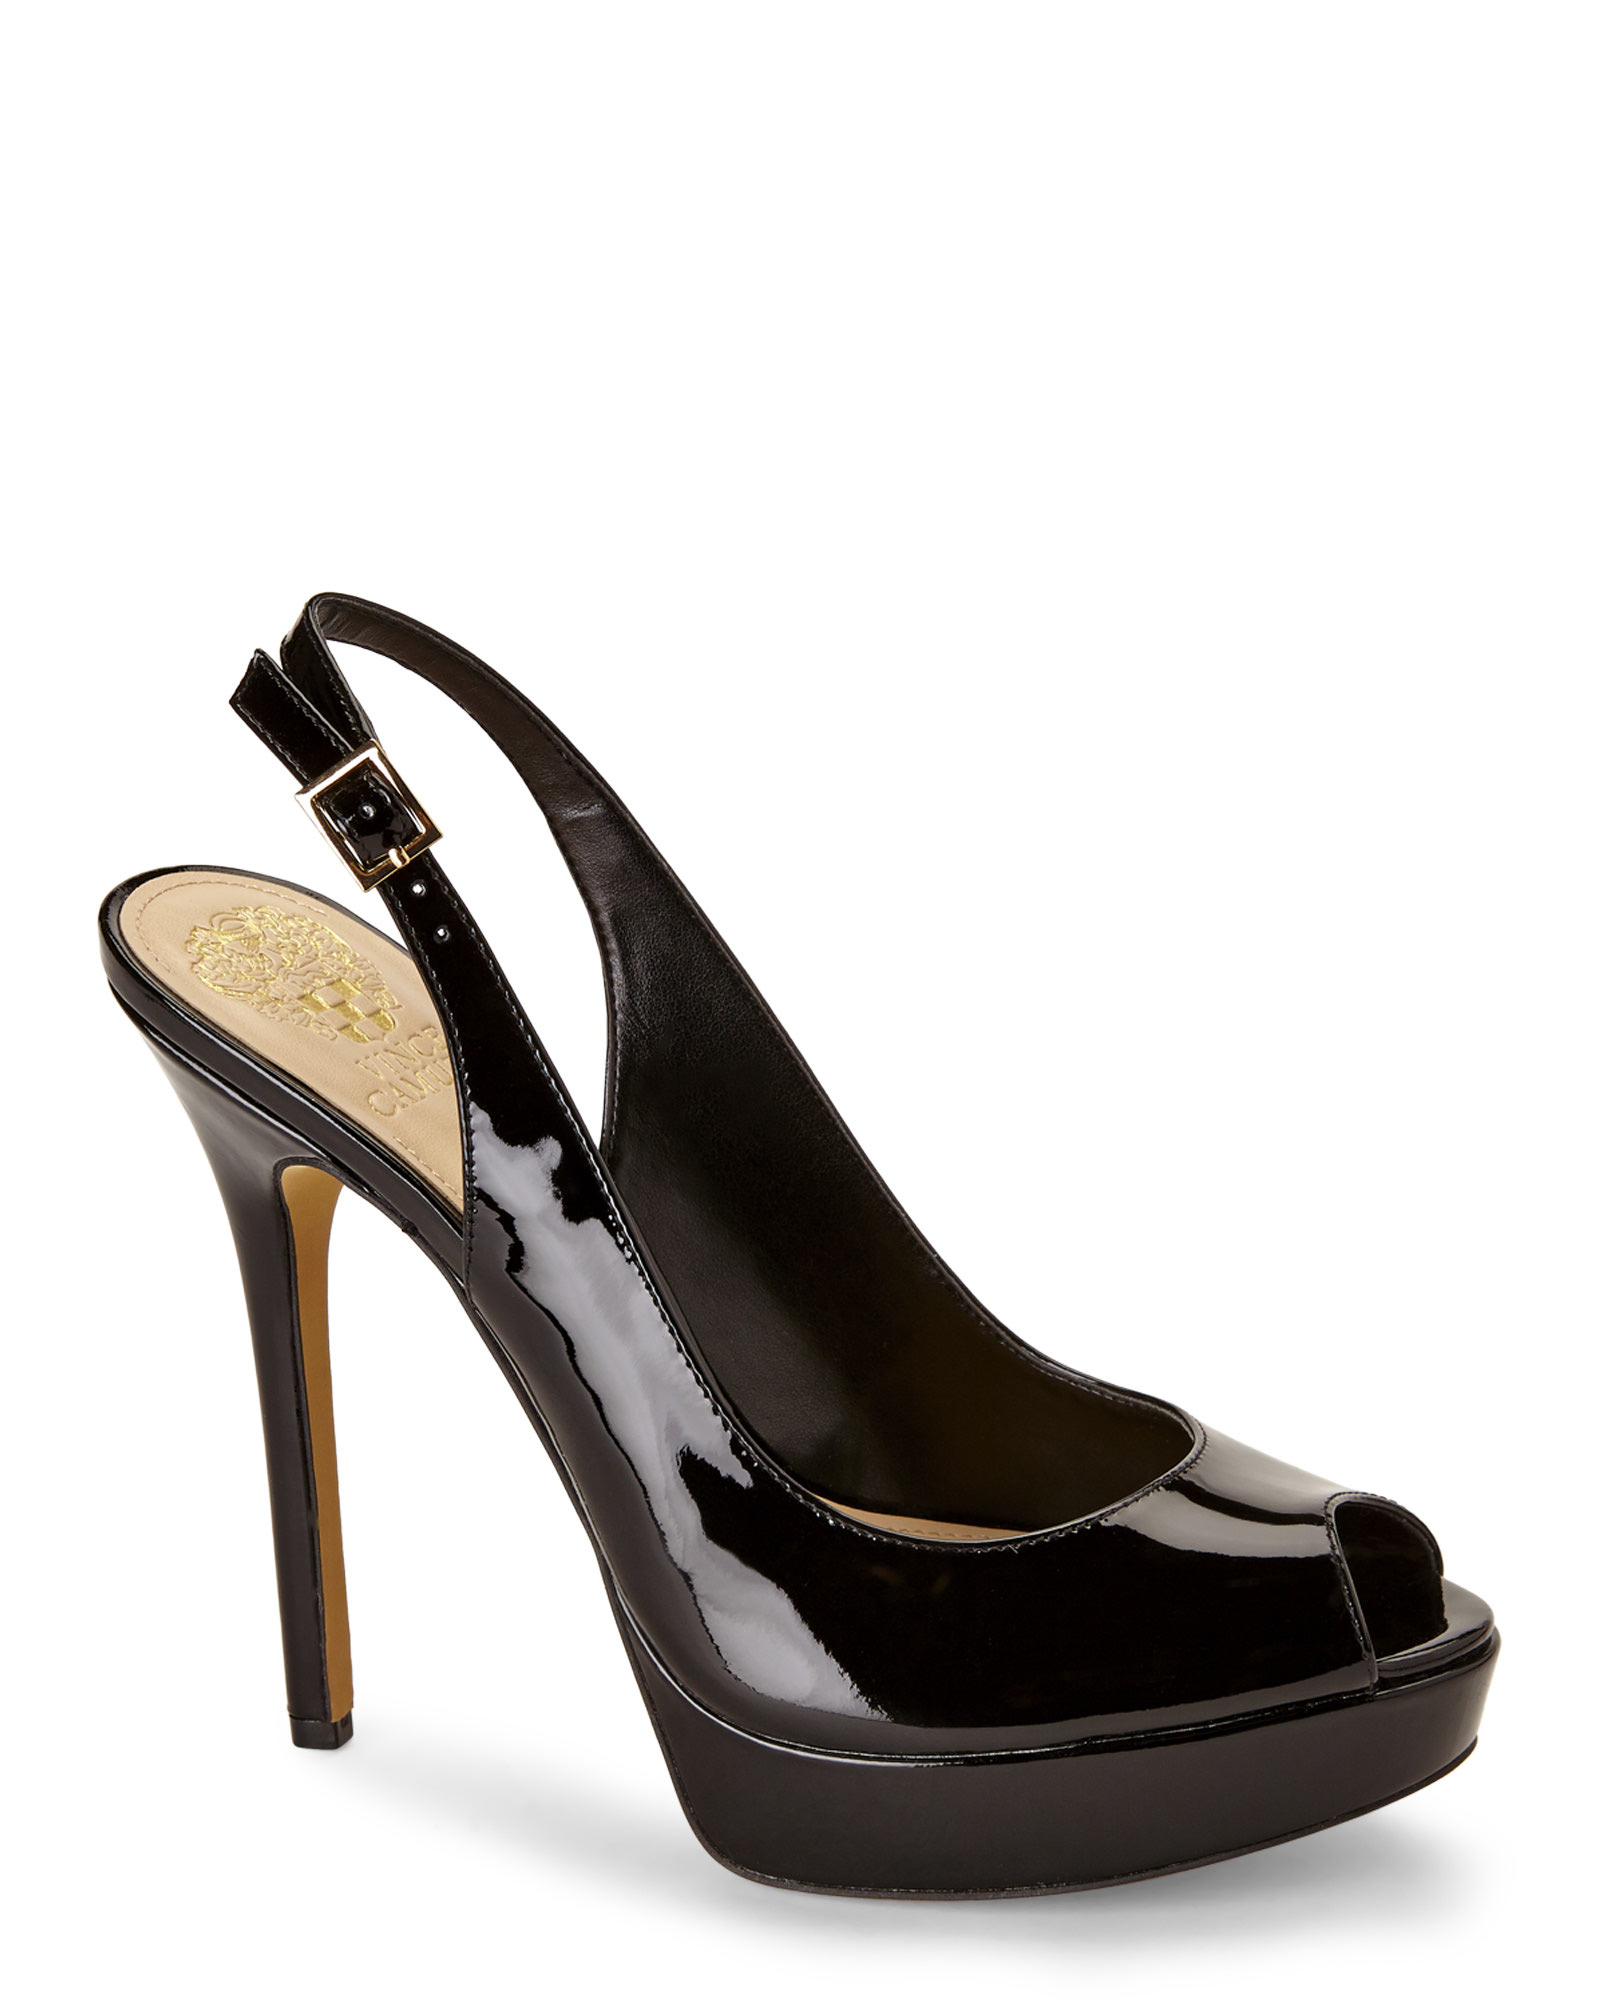 Fall/Winter Nordia Womens Black Vince Camuto Womens Dress Heels Pumps